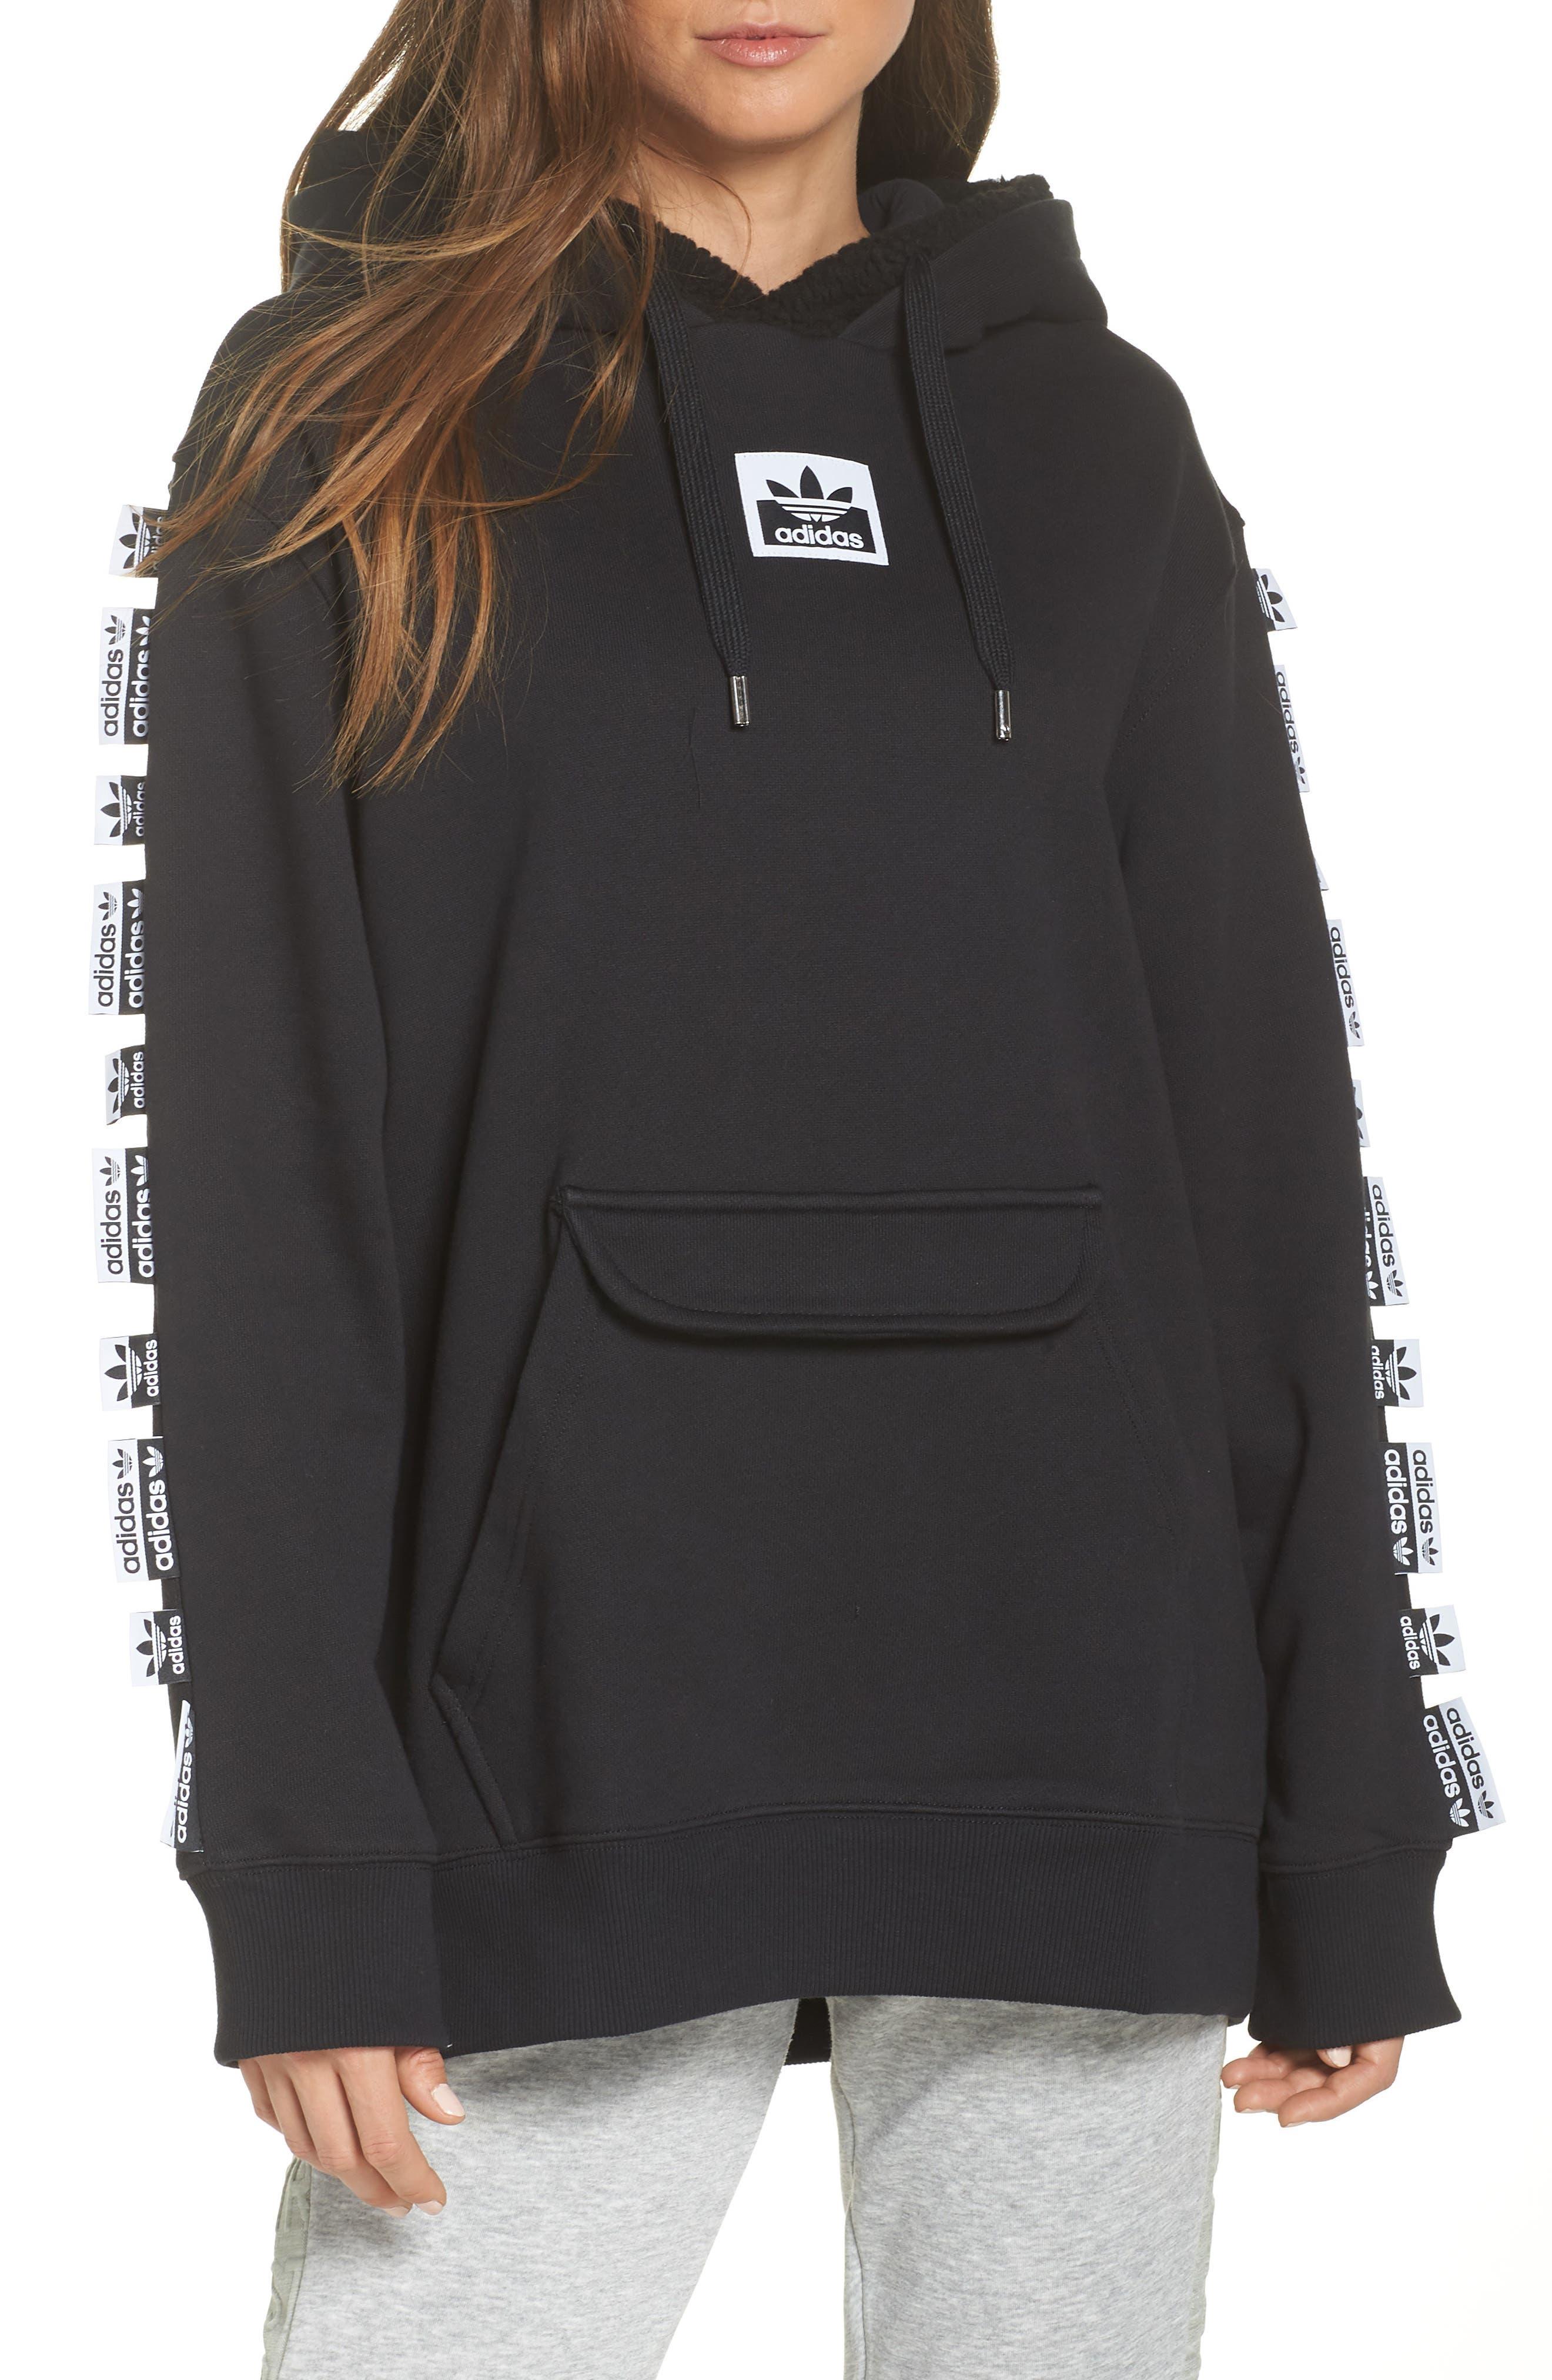 Adidas Originals X Olivia Oblanc Double Hoodie, Black